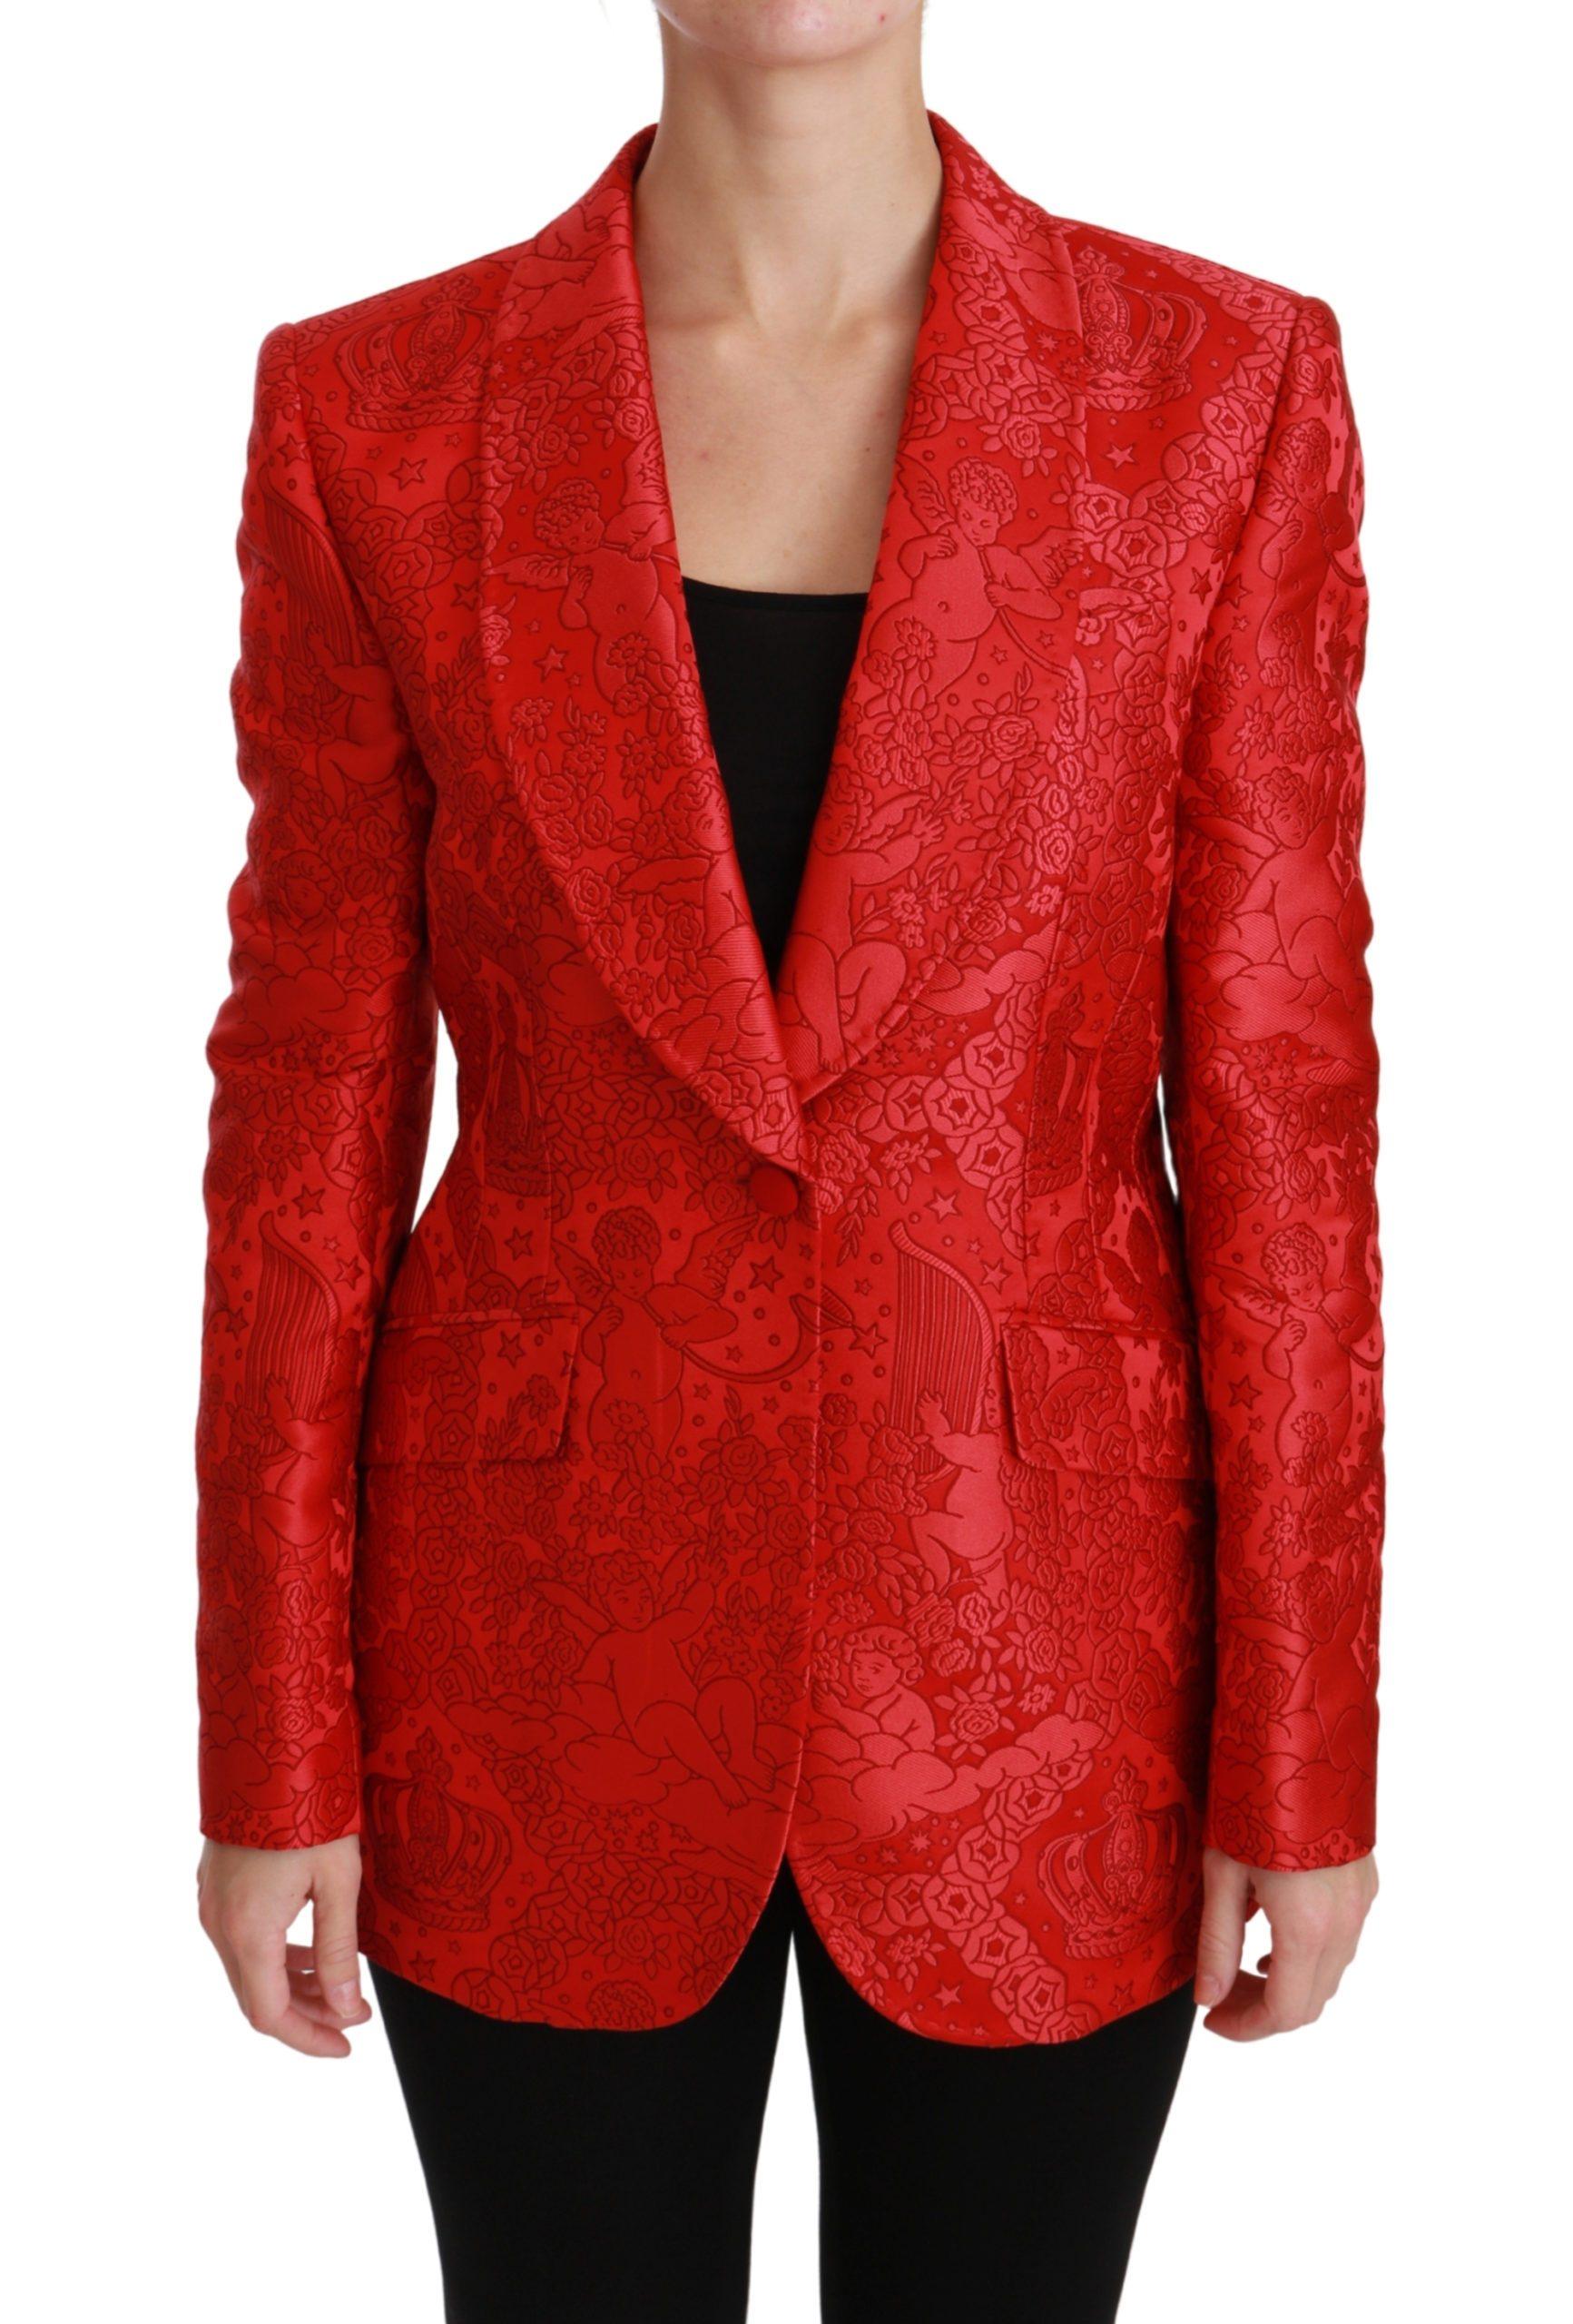 Dolce & Gabbana Women's Floral Angel Blazer Coat Jacket Red JKT2563 - IT46 | L